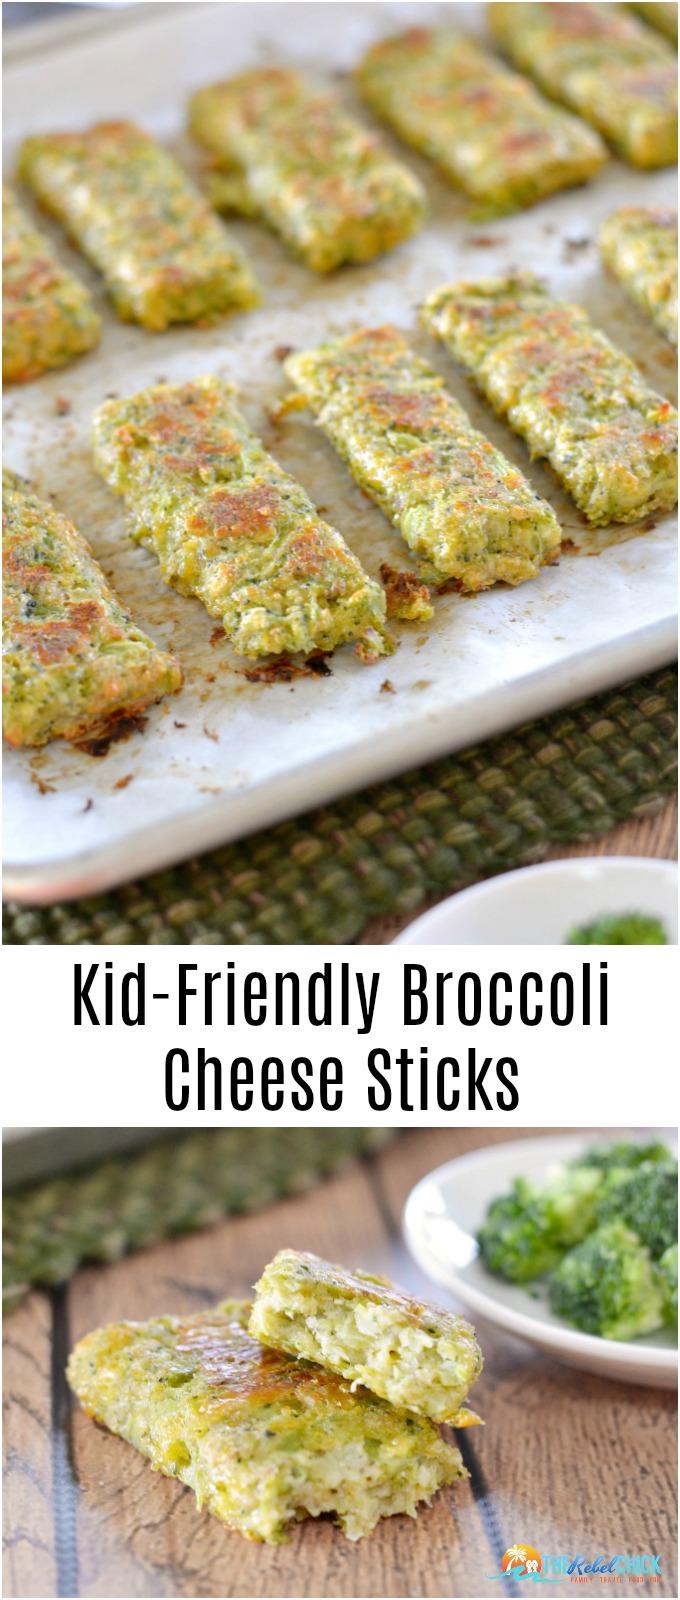 Kid-Friendly Broccoli Cheese Sticks Recipe